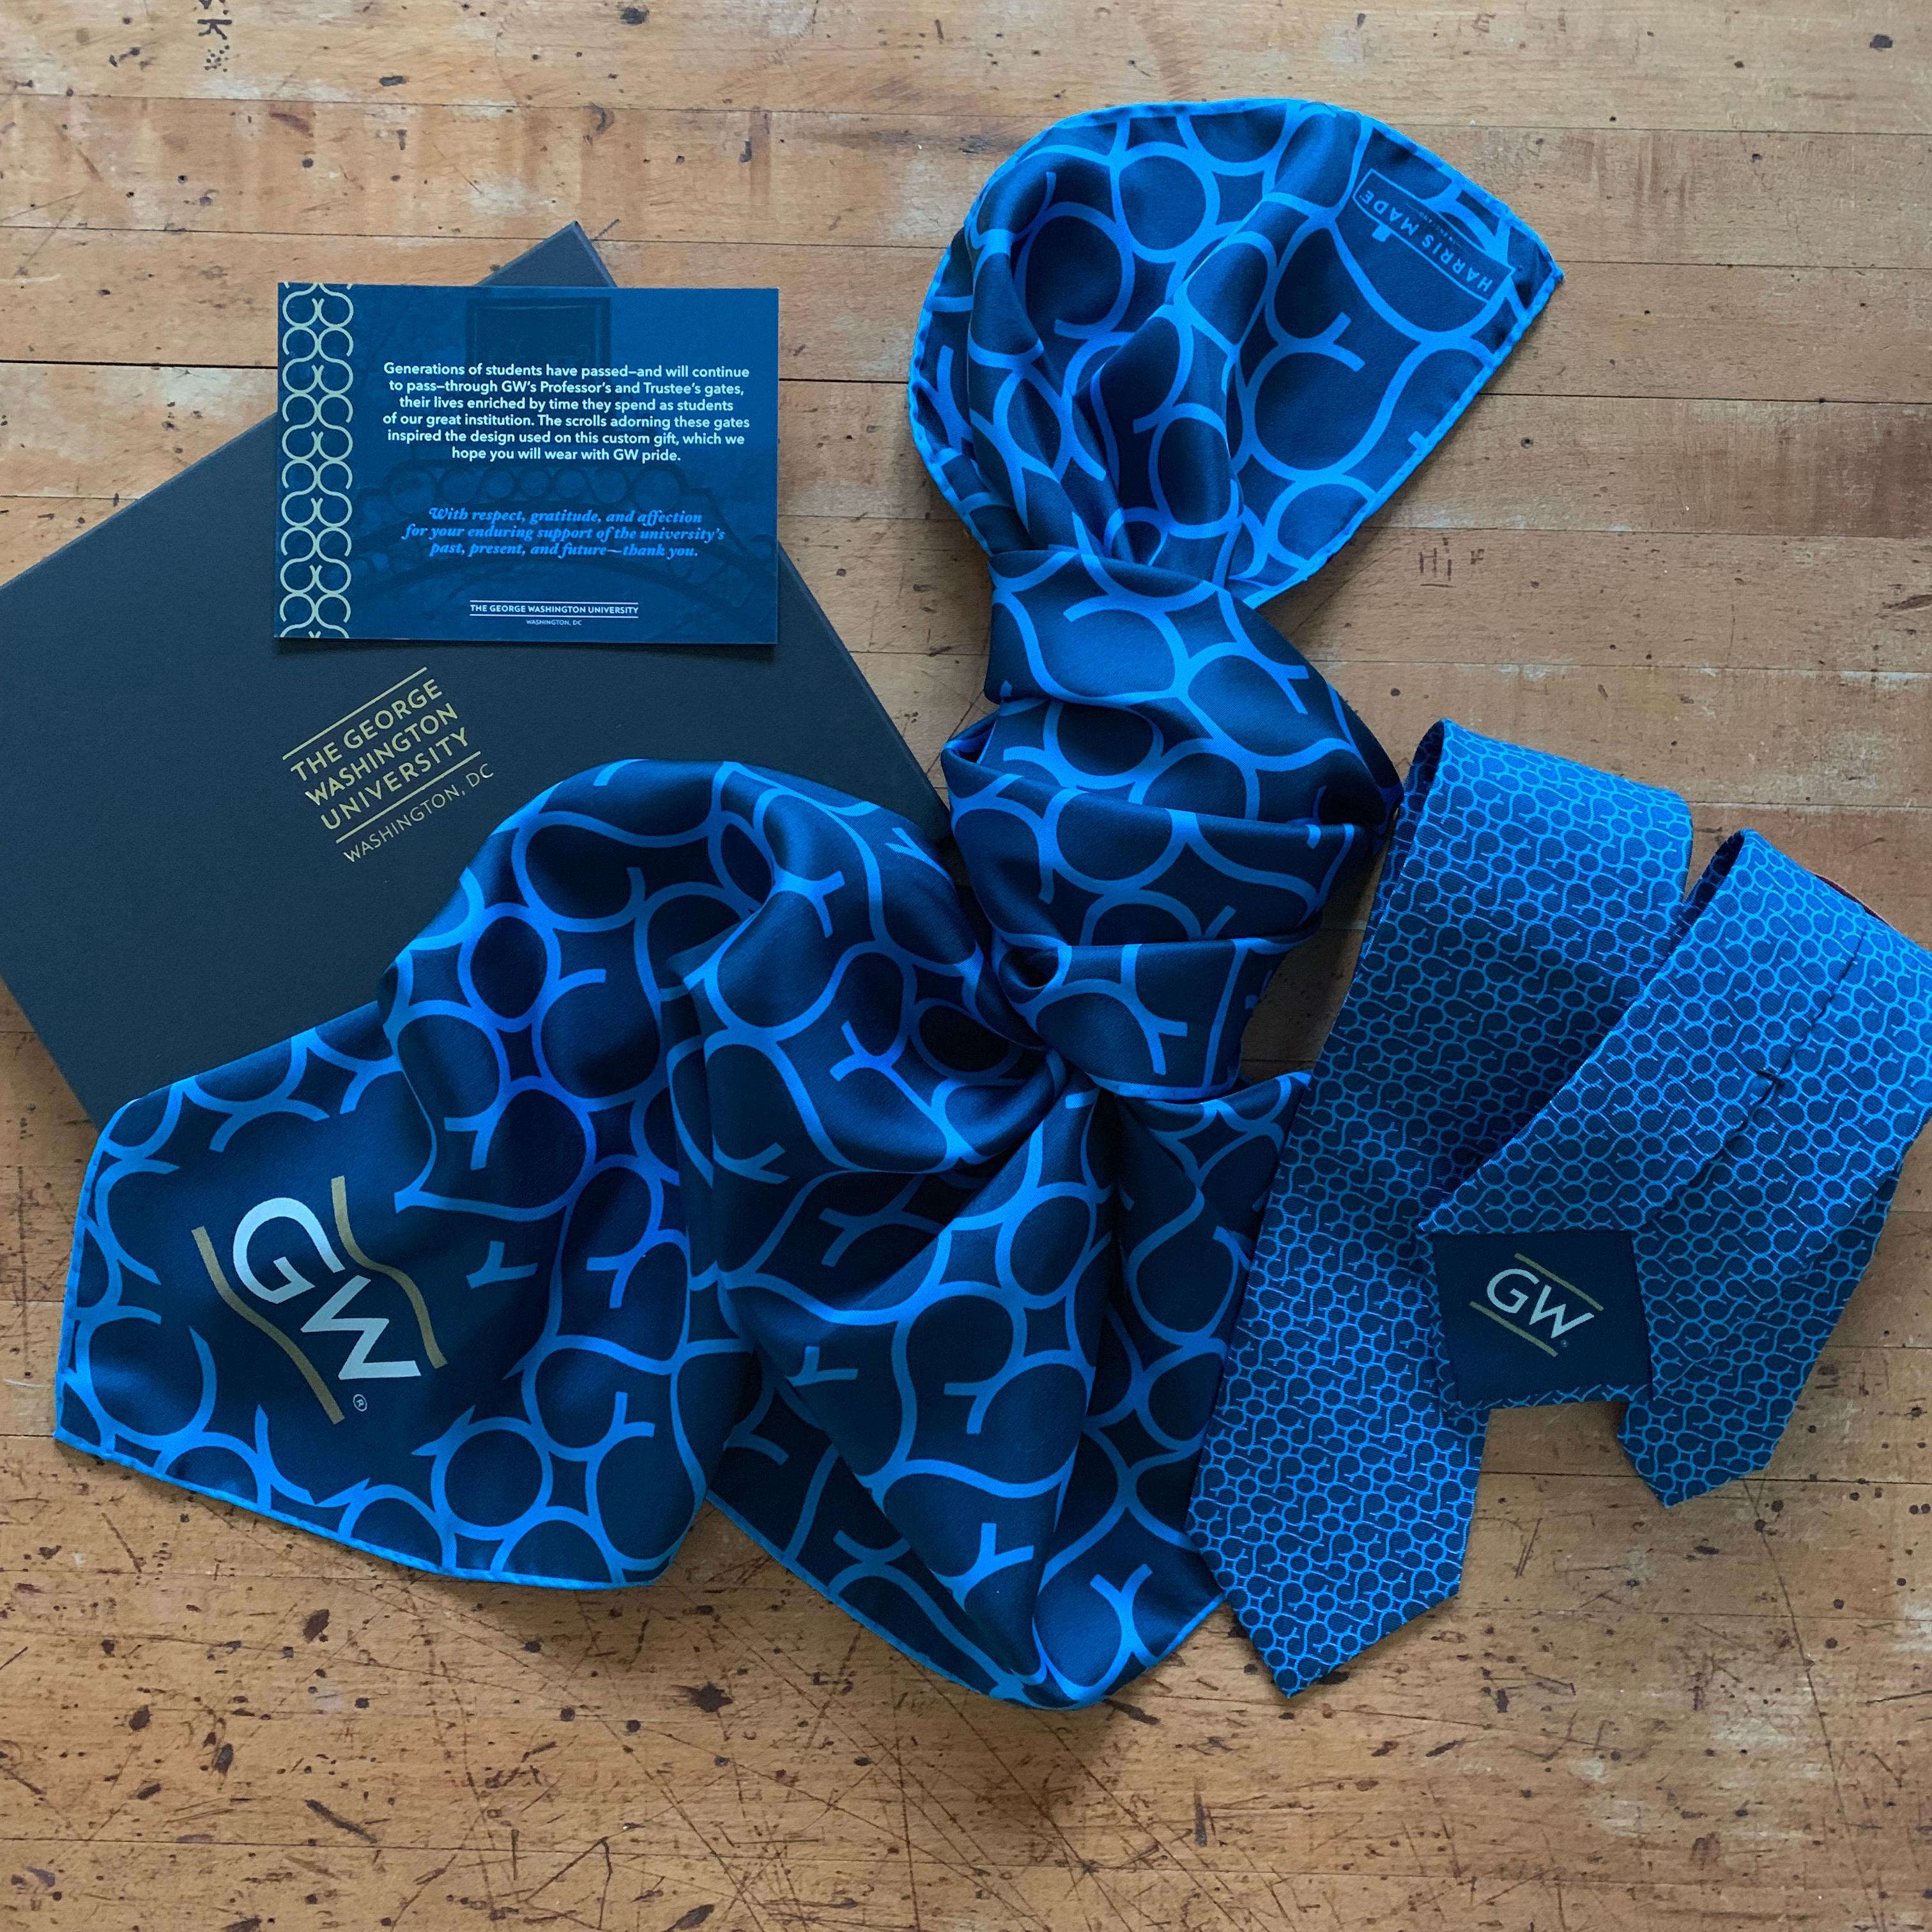 Silk - George Washington University - Blue